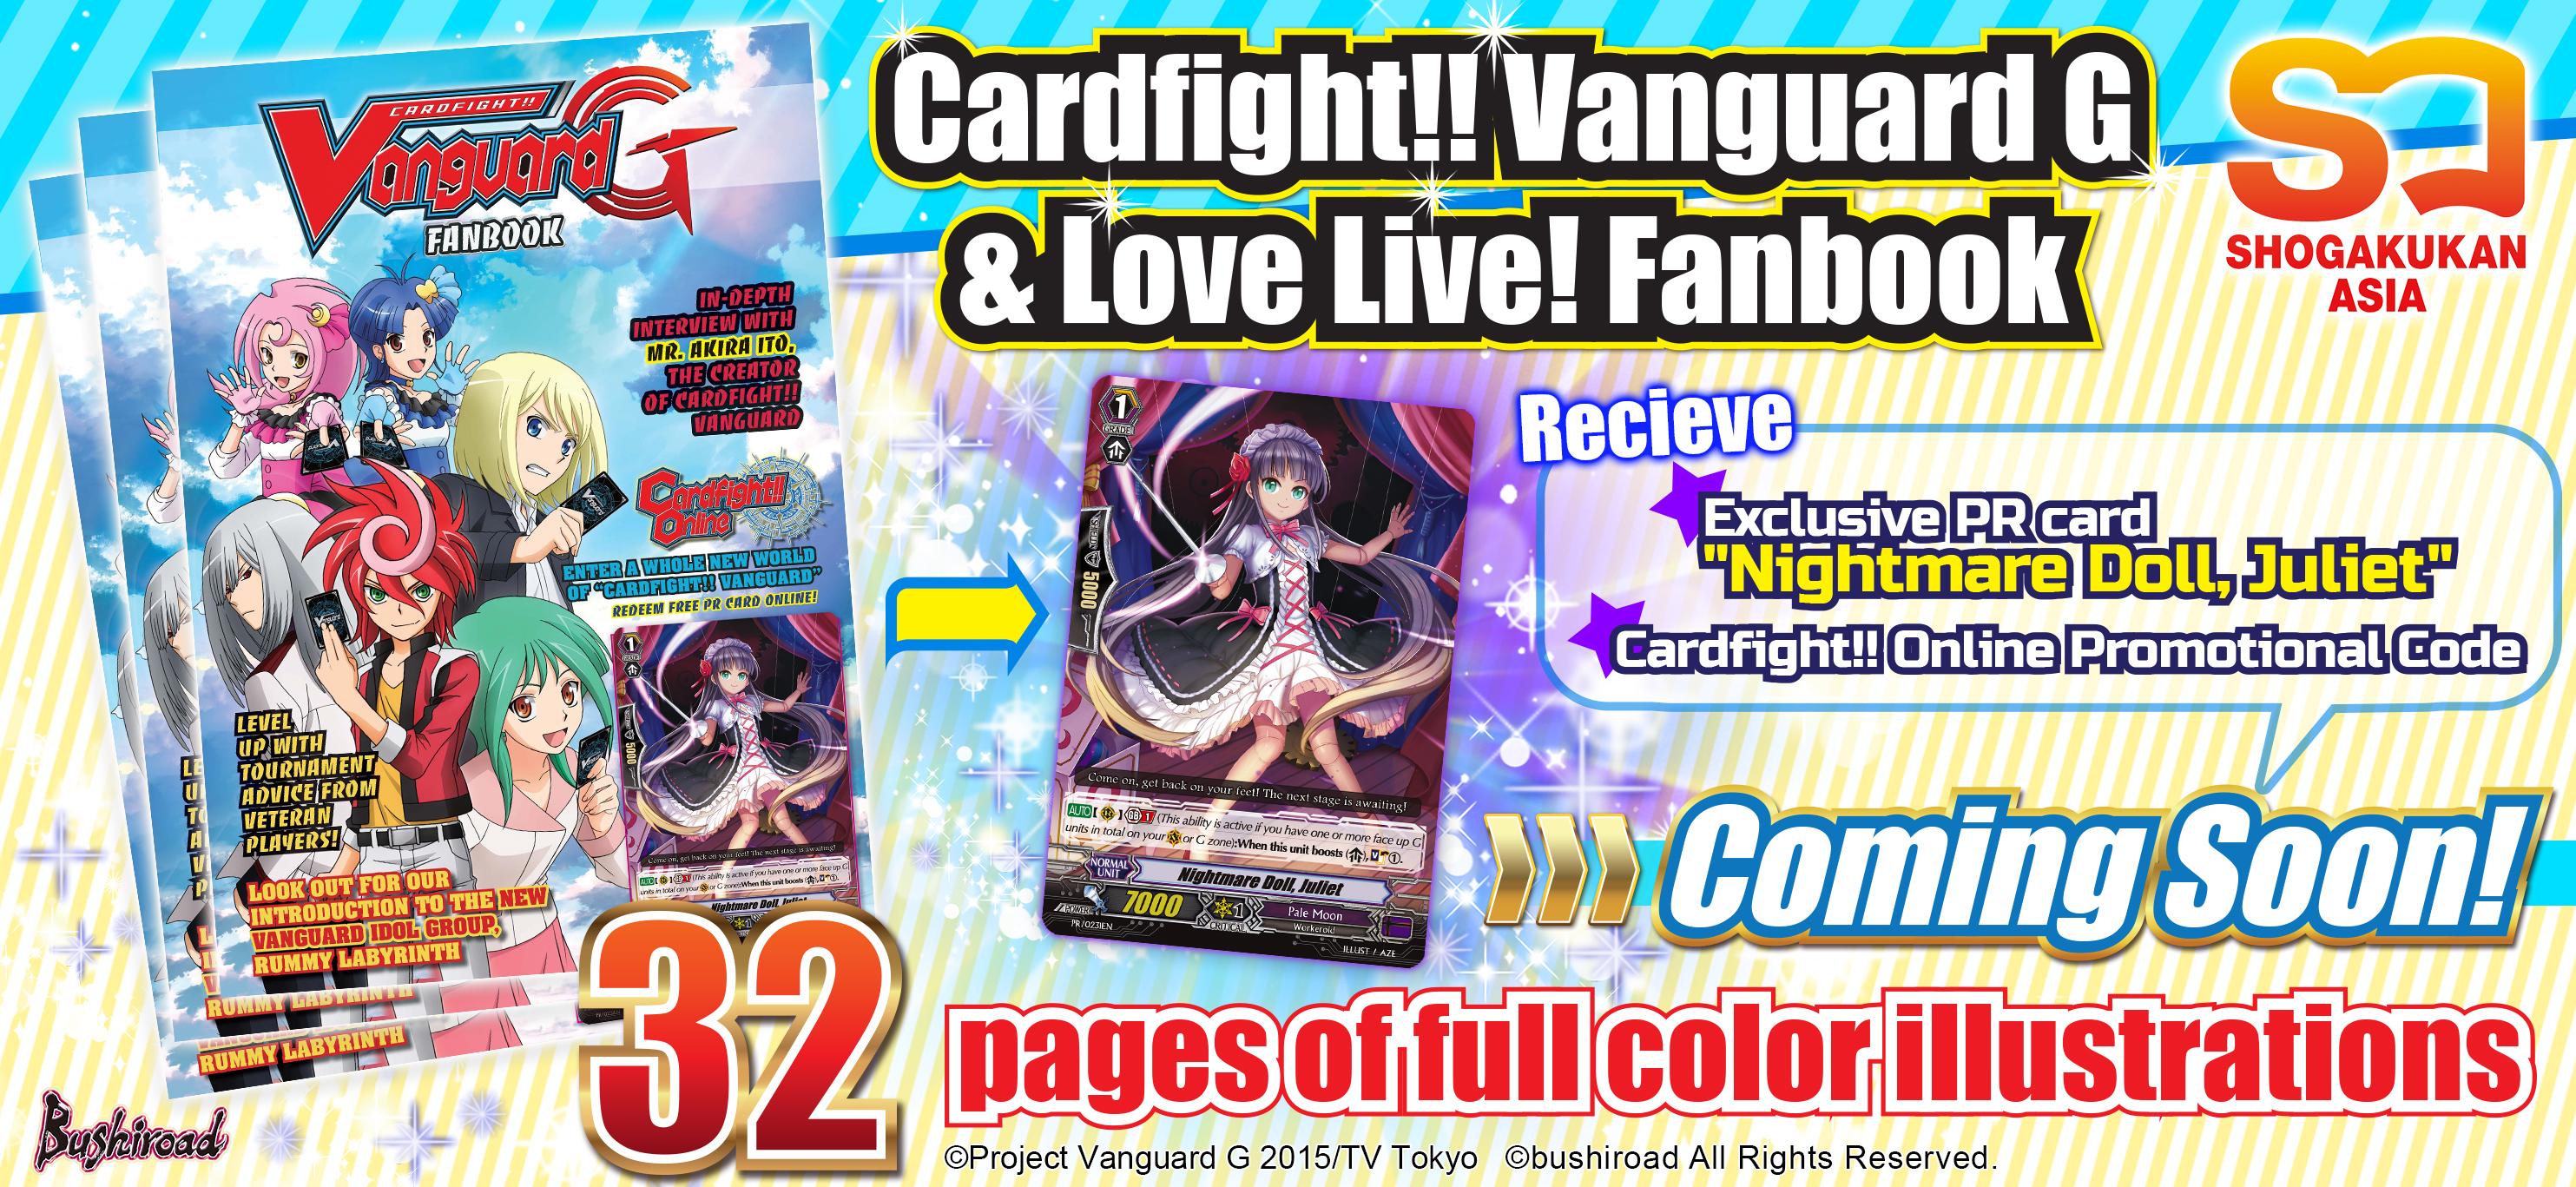 Cardfight!! Vanguard G & Love Live! Fanbook